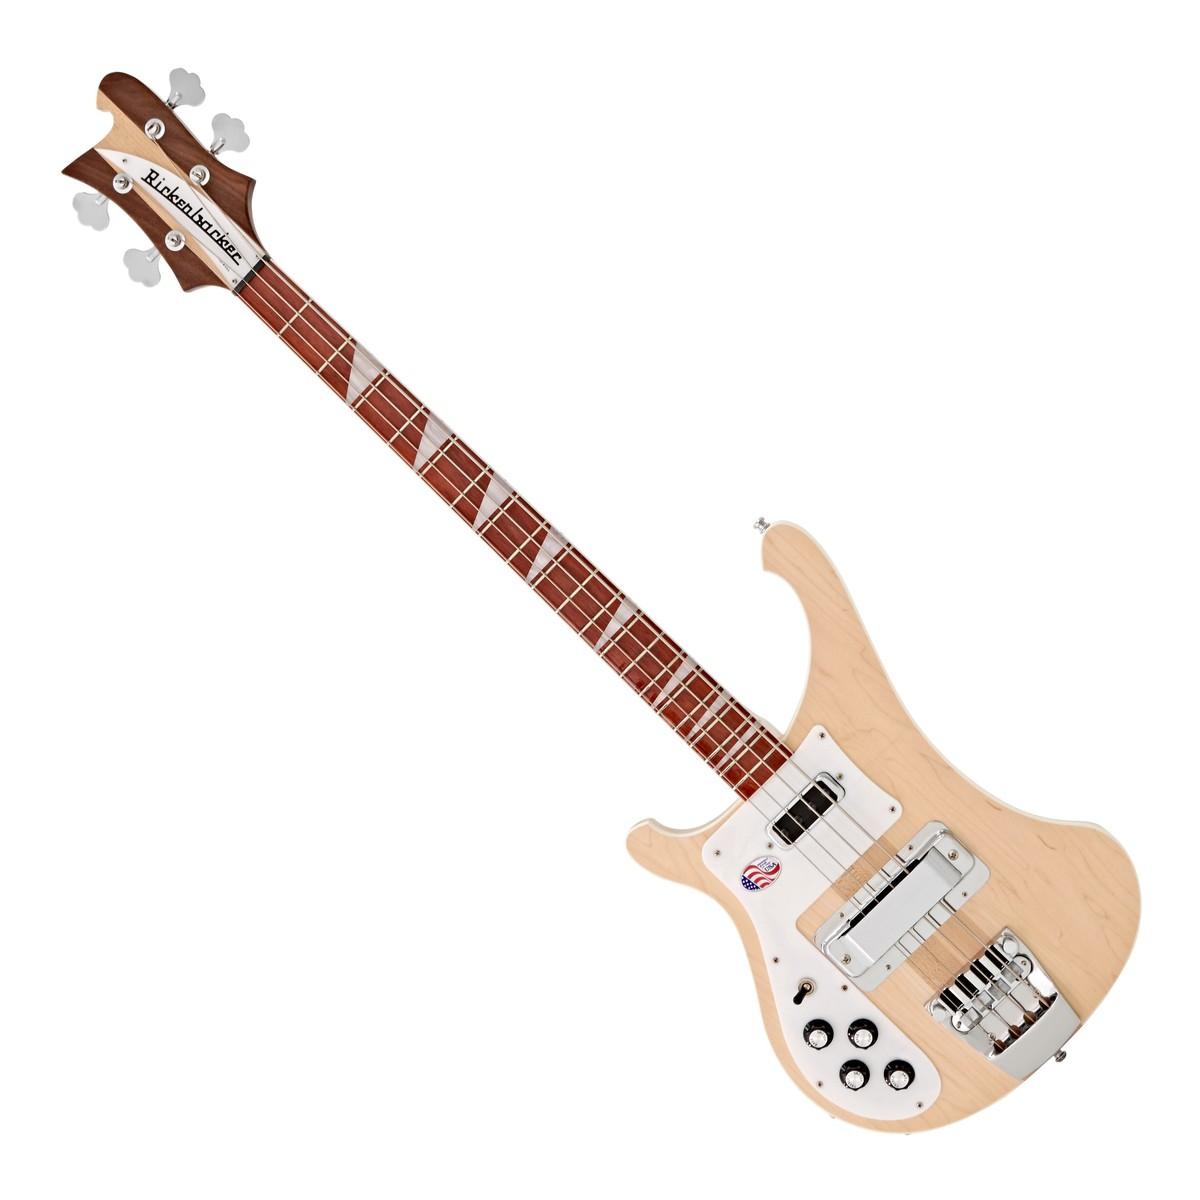 rickenbacker 4003 left handed bass guitar mapleglo at gear4music. Black Bedroom Furniture Sets. Home Design Ideas